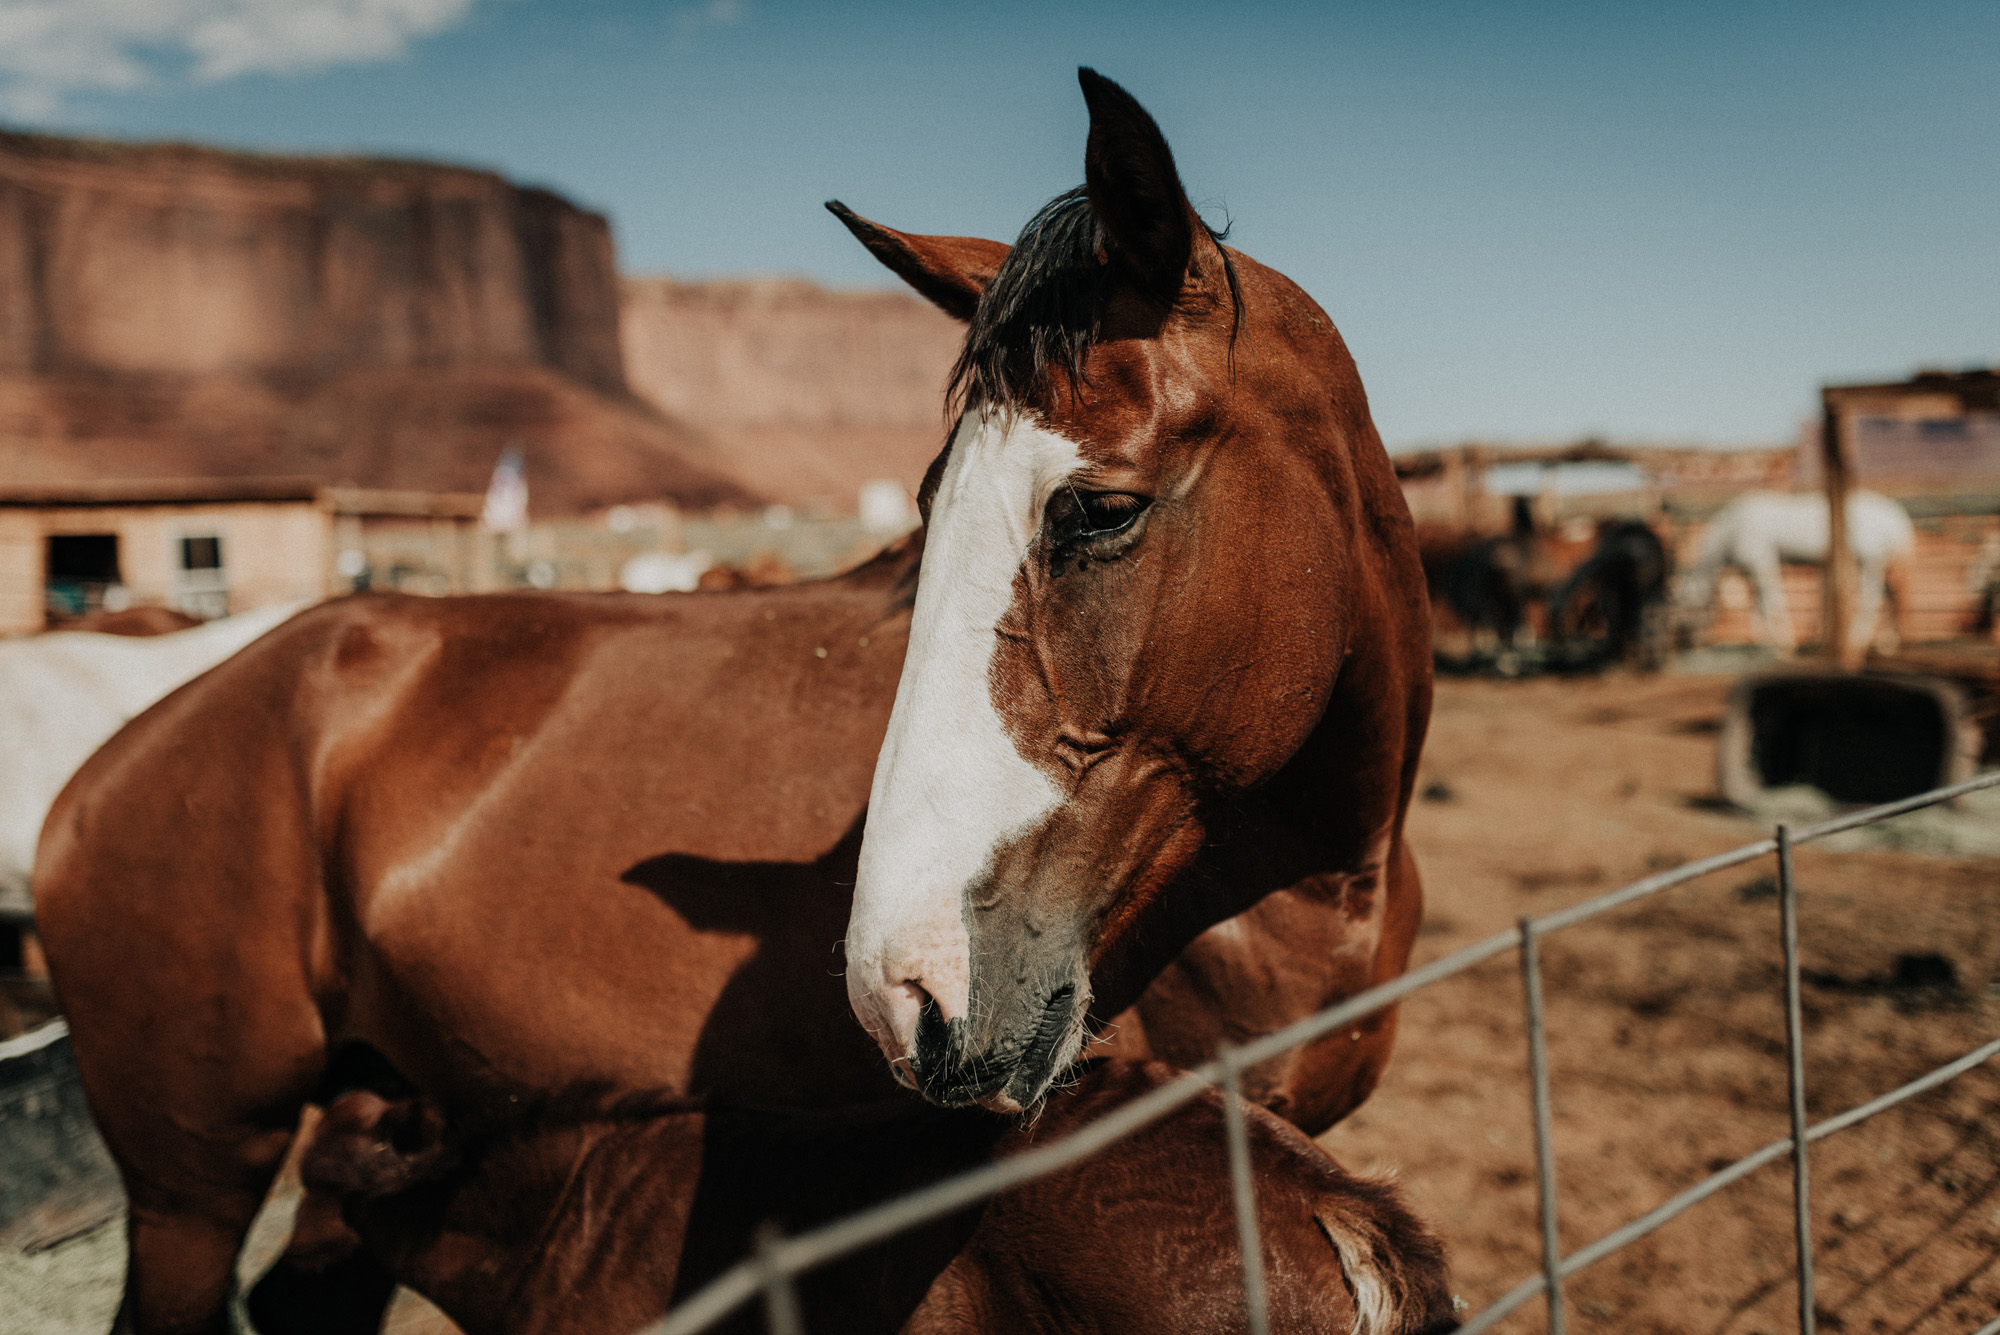 monument valley utah ut kylewillisphoto demurela horses